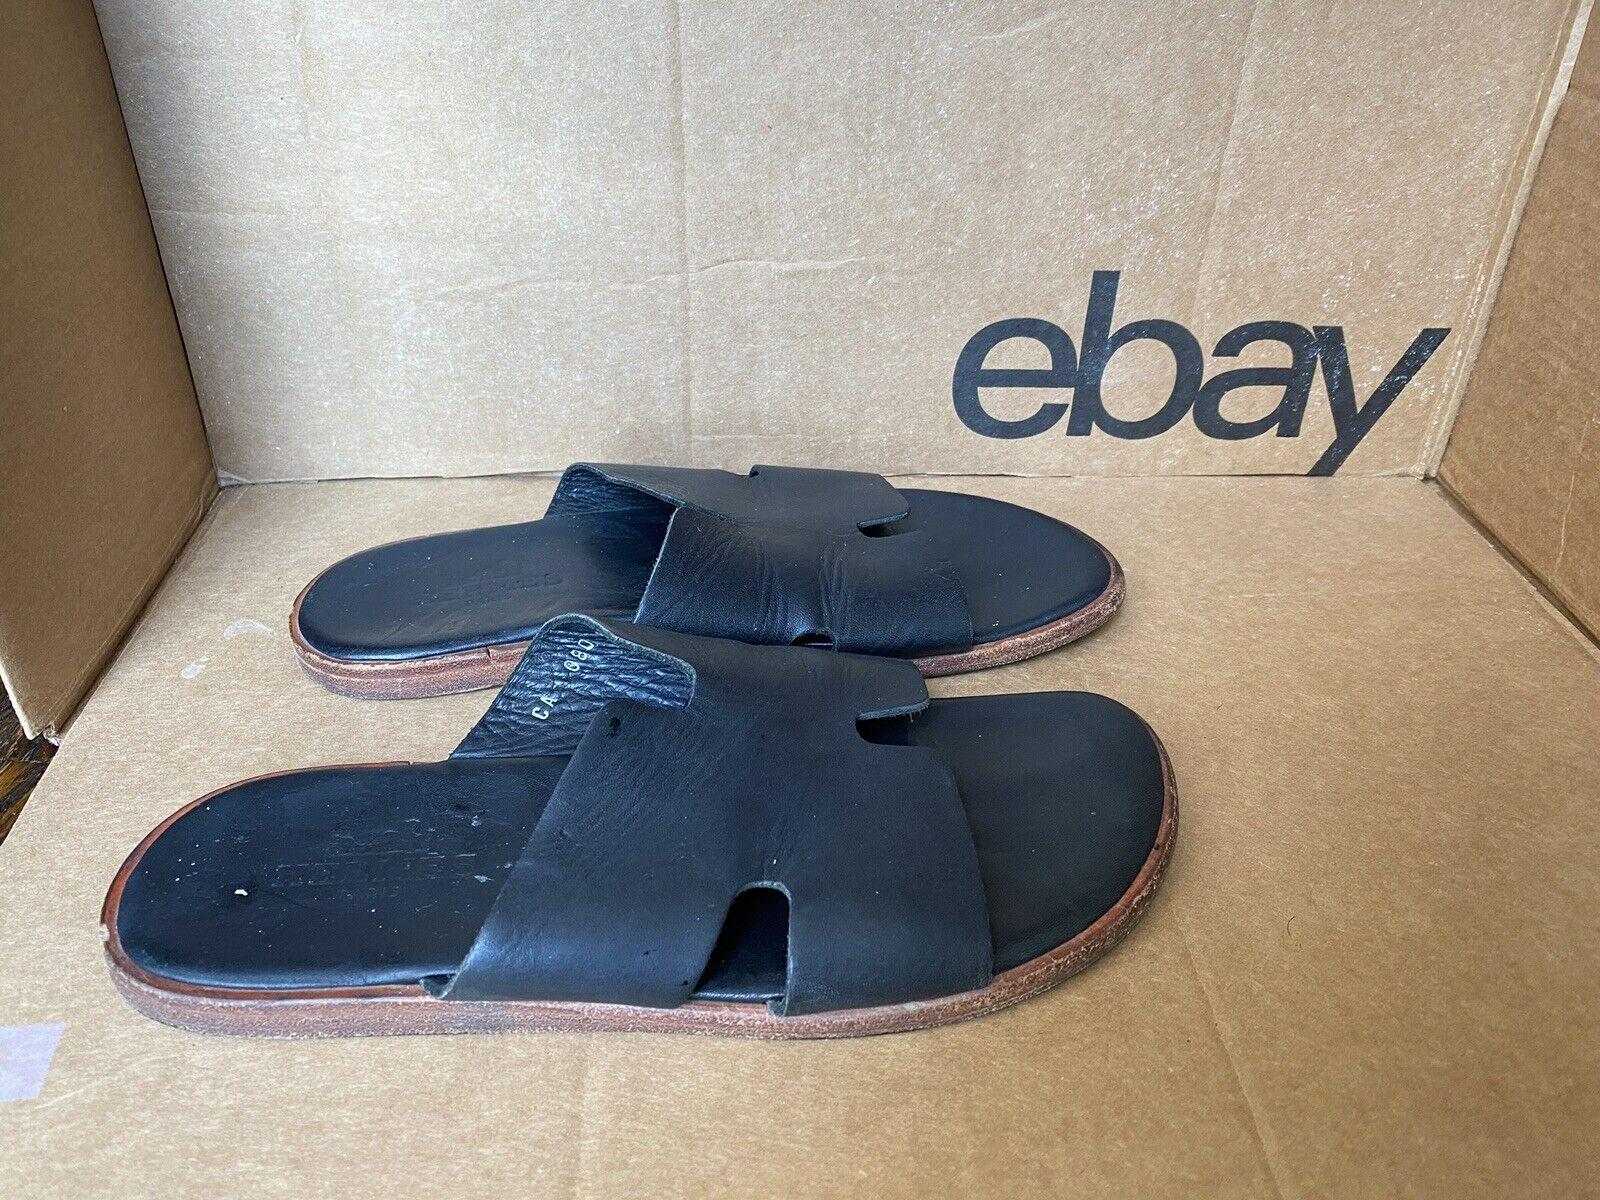 Hermes of Paris Men's Black Leather Sandals/Slide Size EU40 Us 7,5